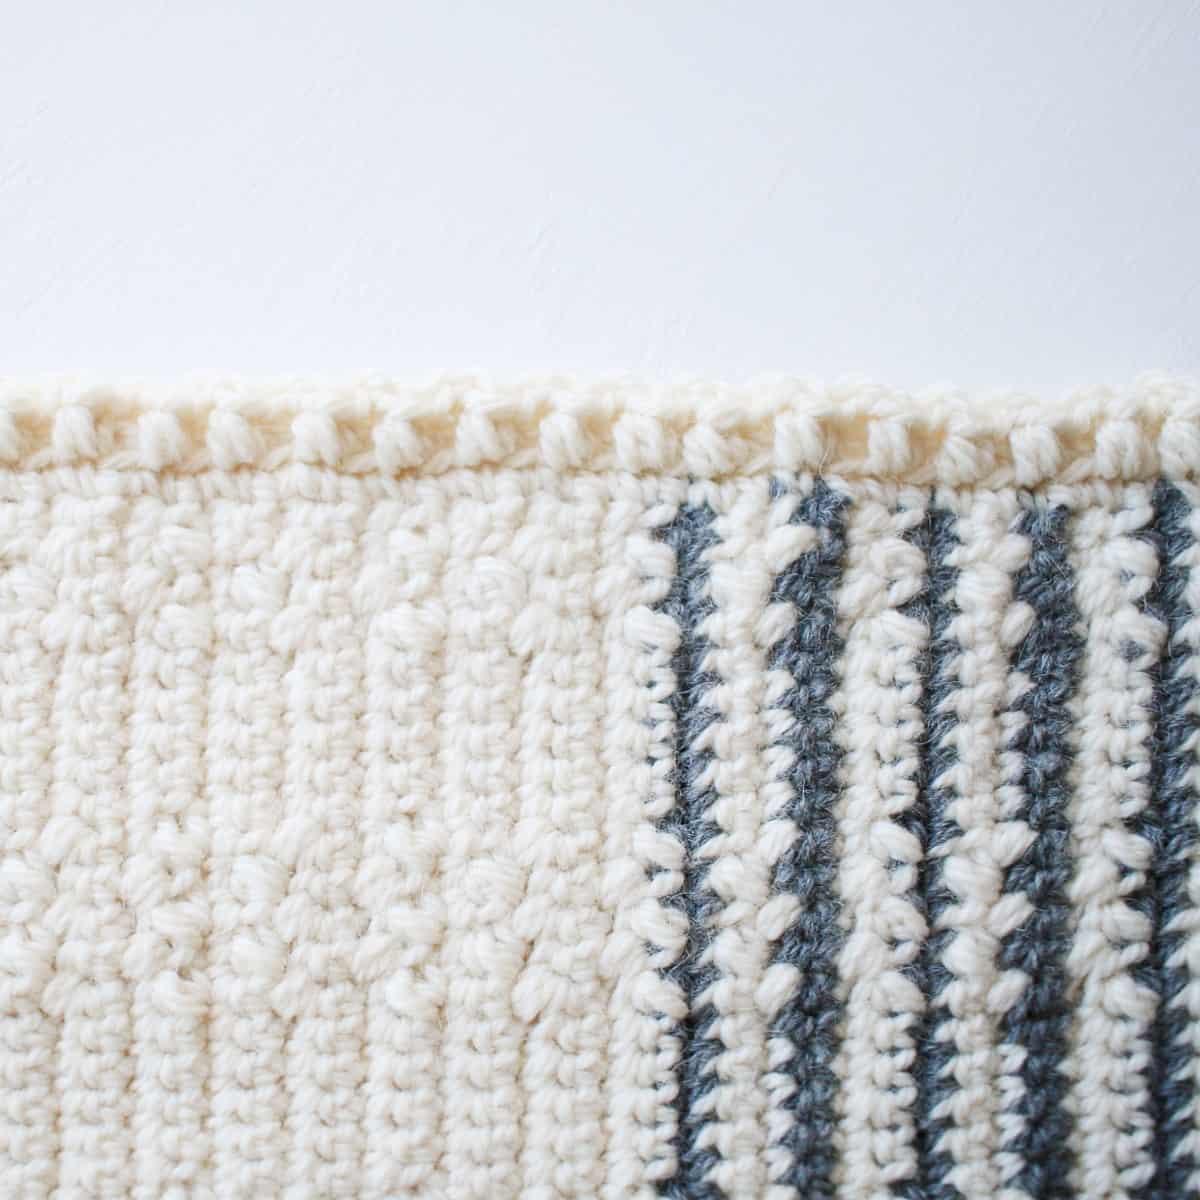 Wundran Baby Blanket Edging Closeup